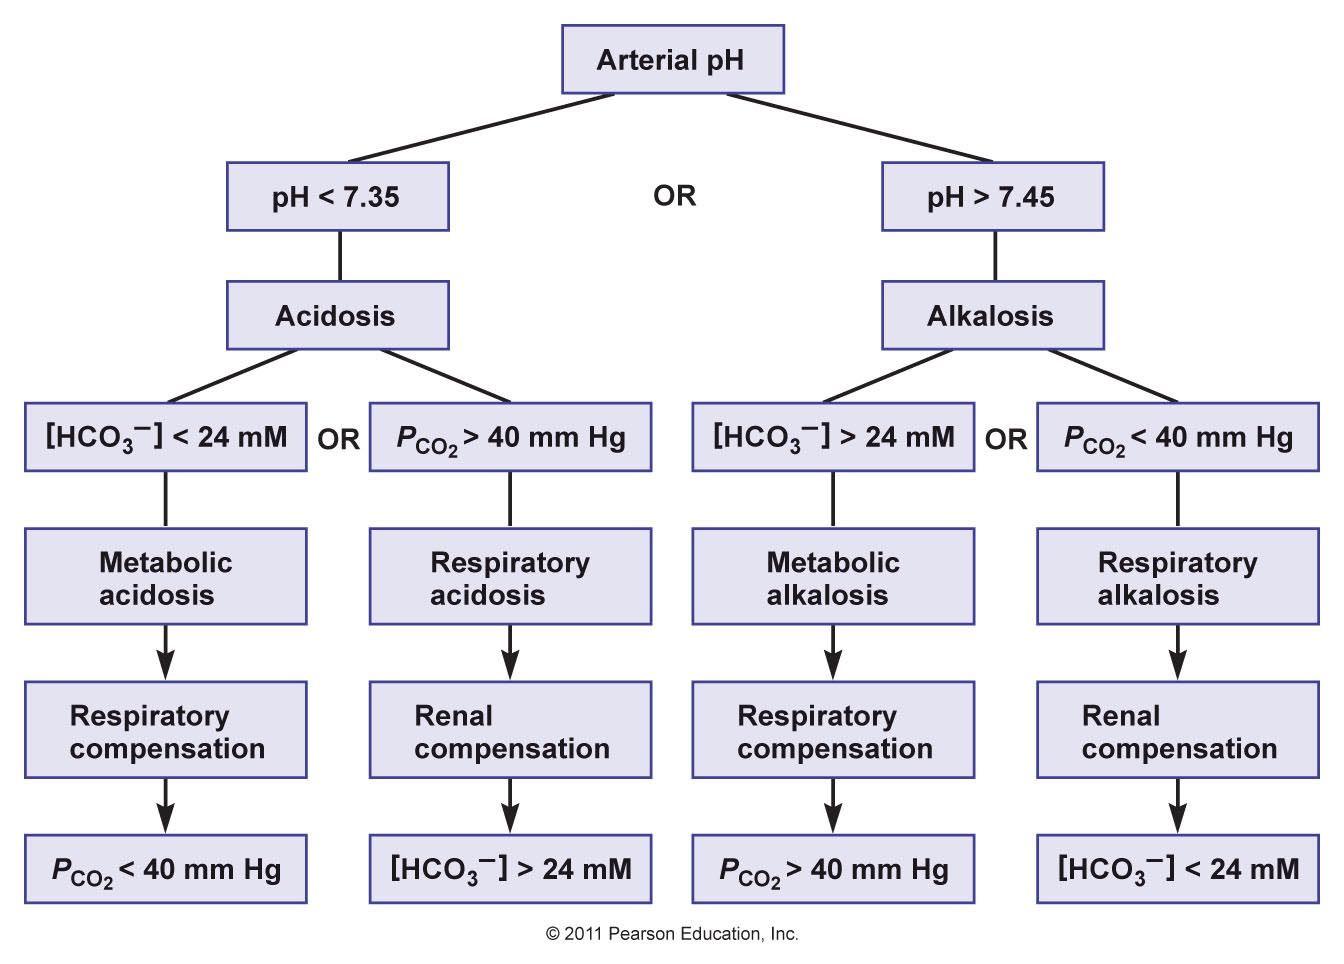 hight resolution of acid base balance evaluation of acid base disturbances diagnosis of acid base